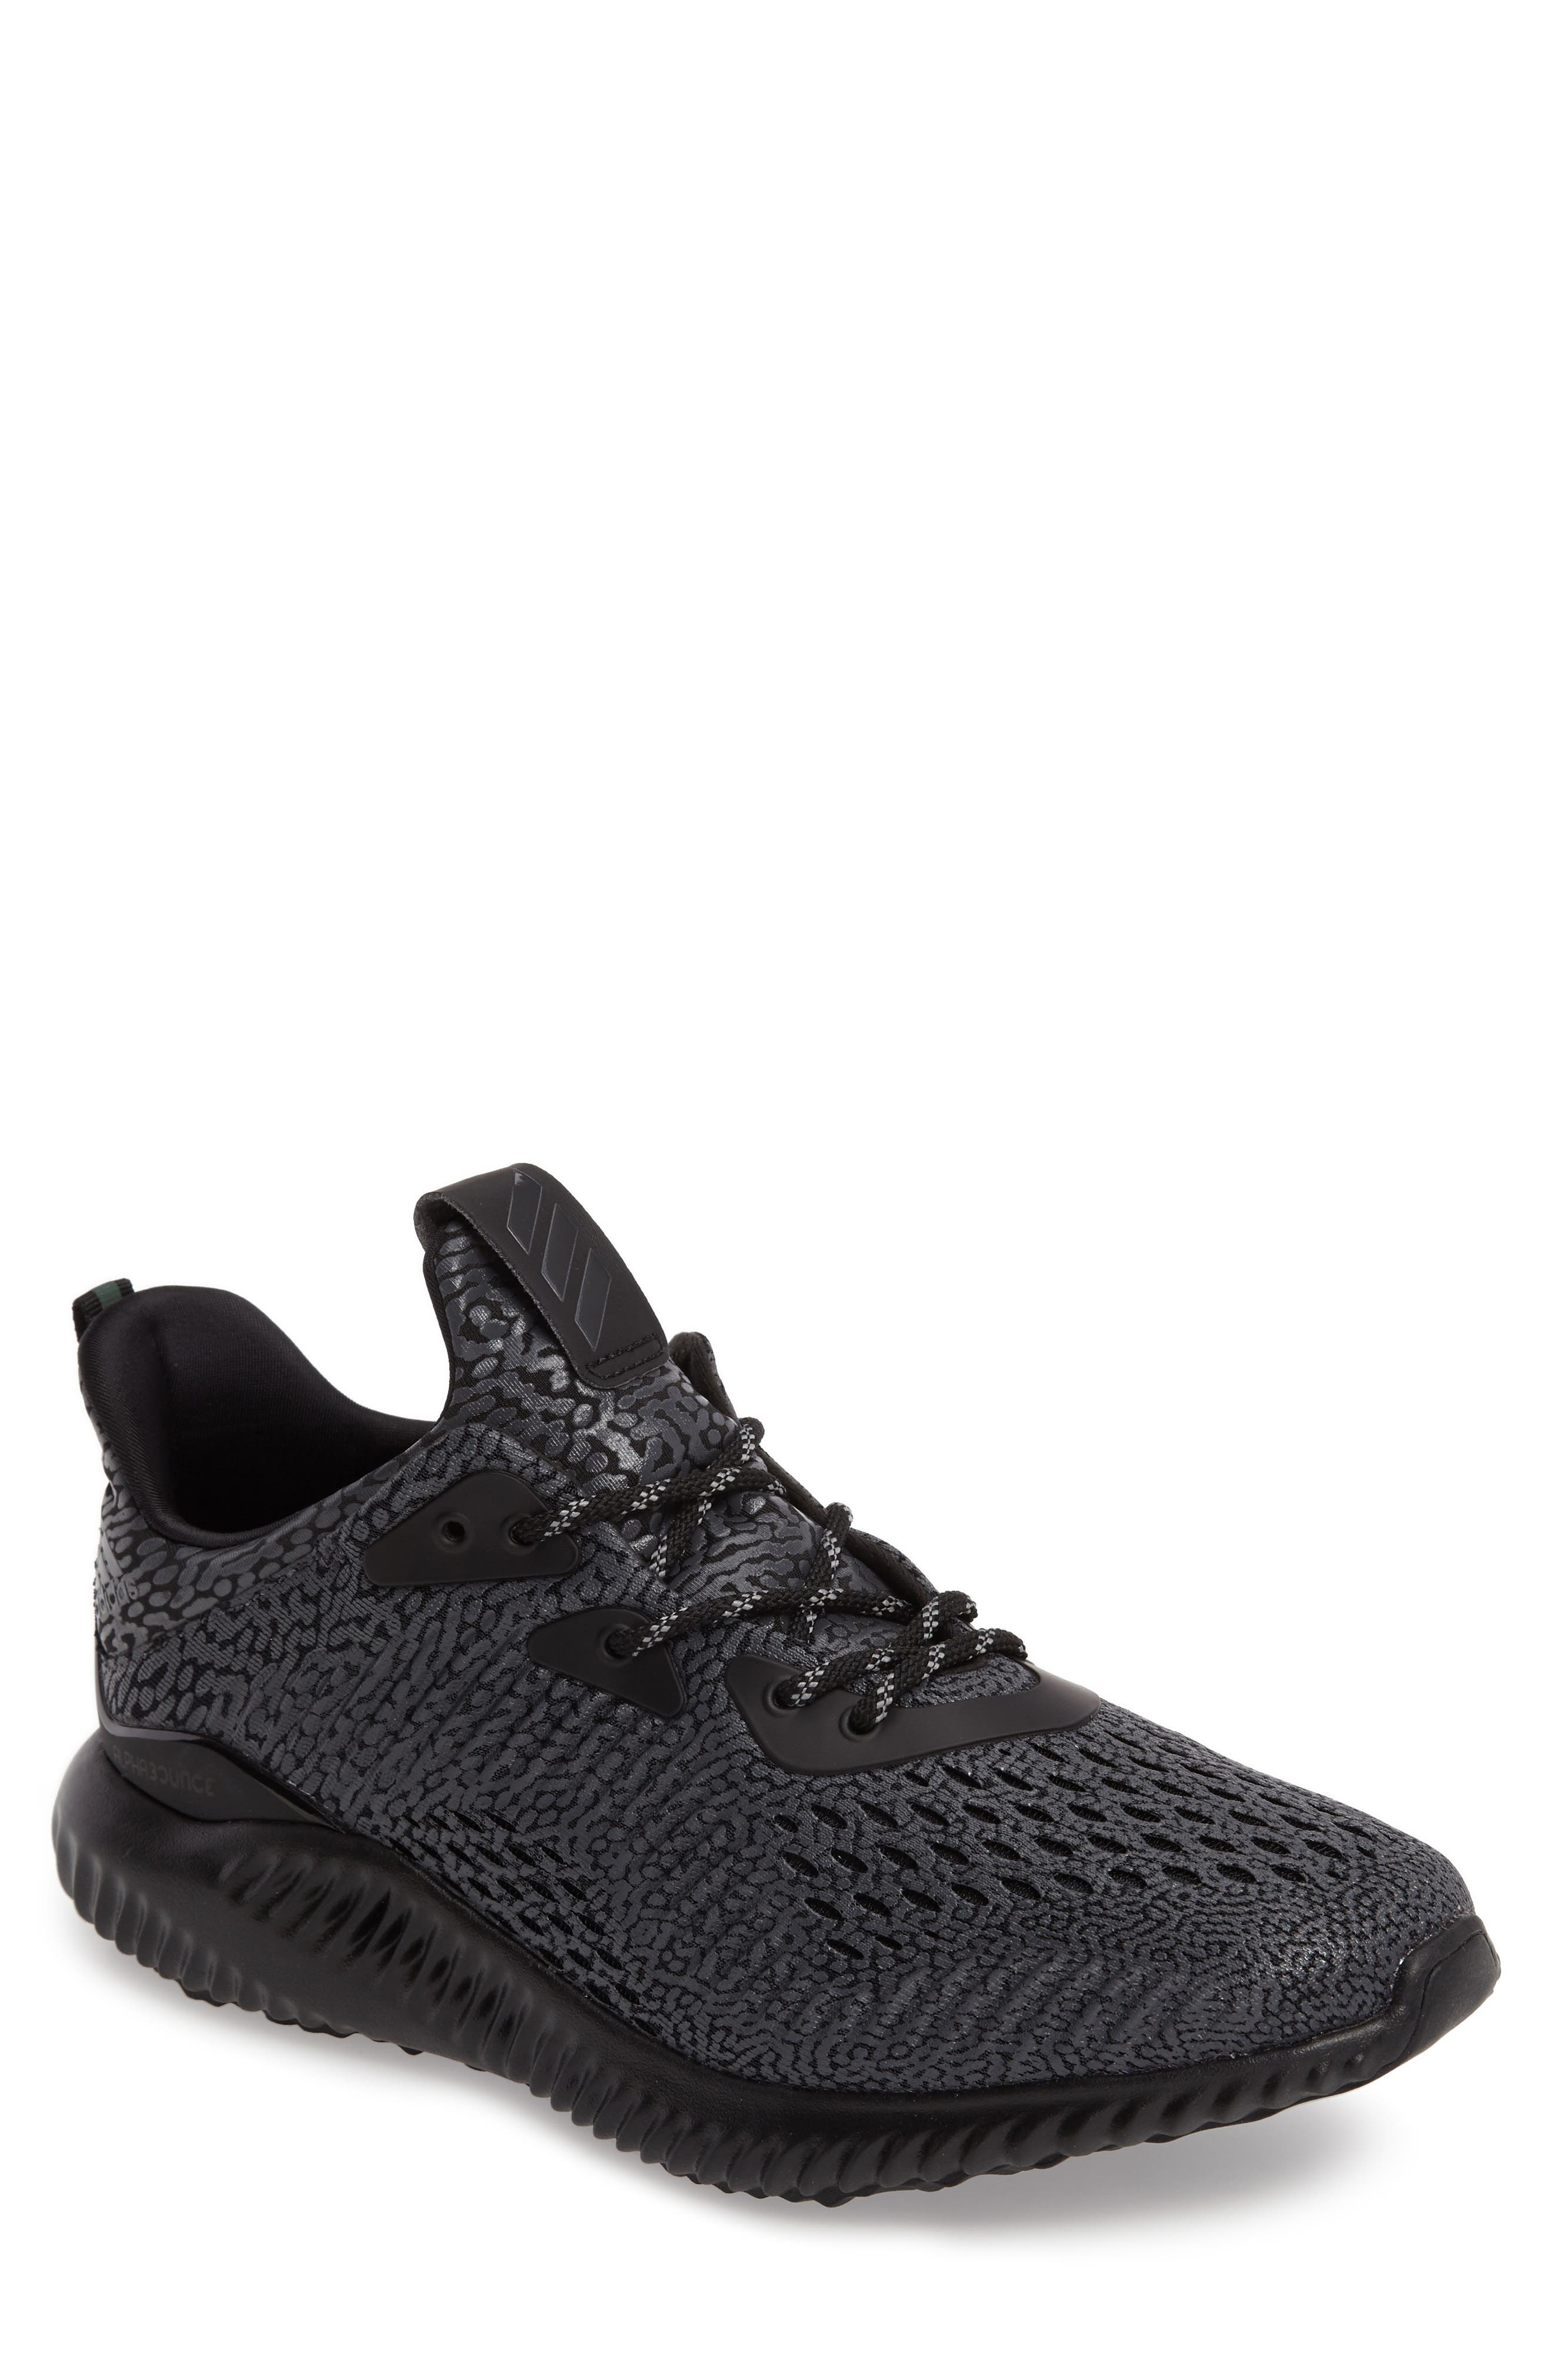 AlphaBounce Aramis Sneaker,                             Main thumbnail 1, color,                             001